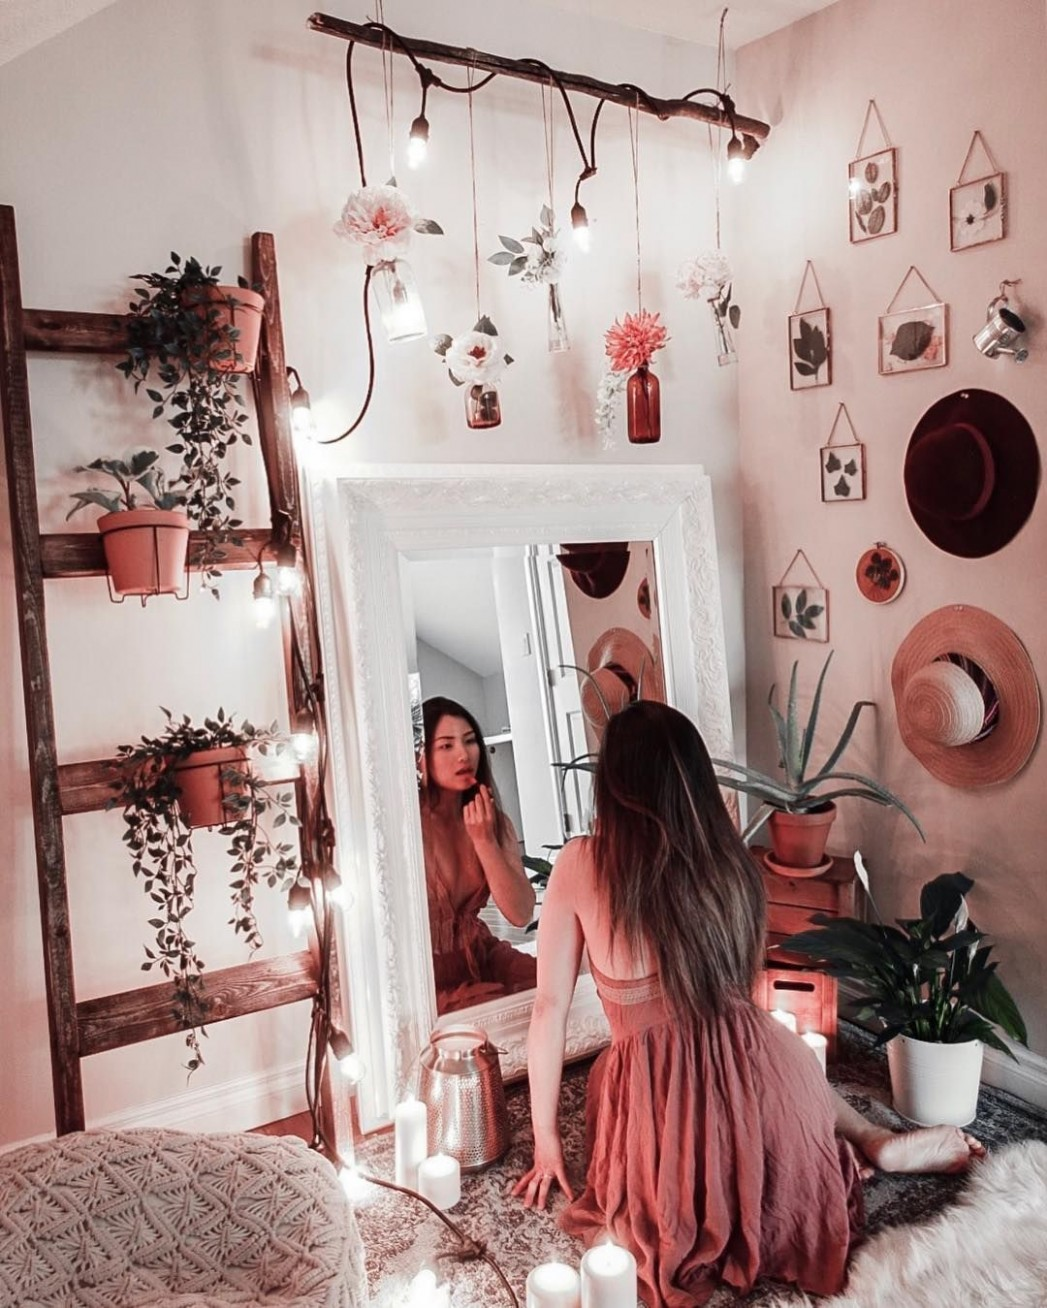 9 Cozy Diy Apartment Decor Ideas - DECOONA  Bedroom decor, Diy  - Apartment Decor Ideas Diy